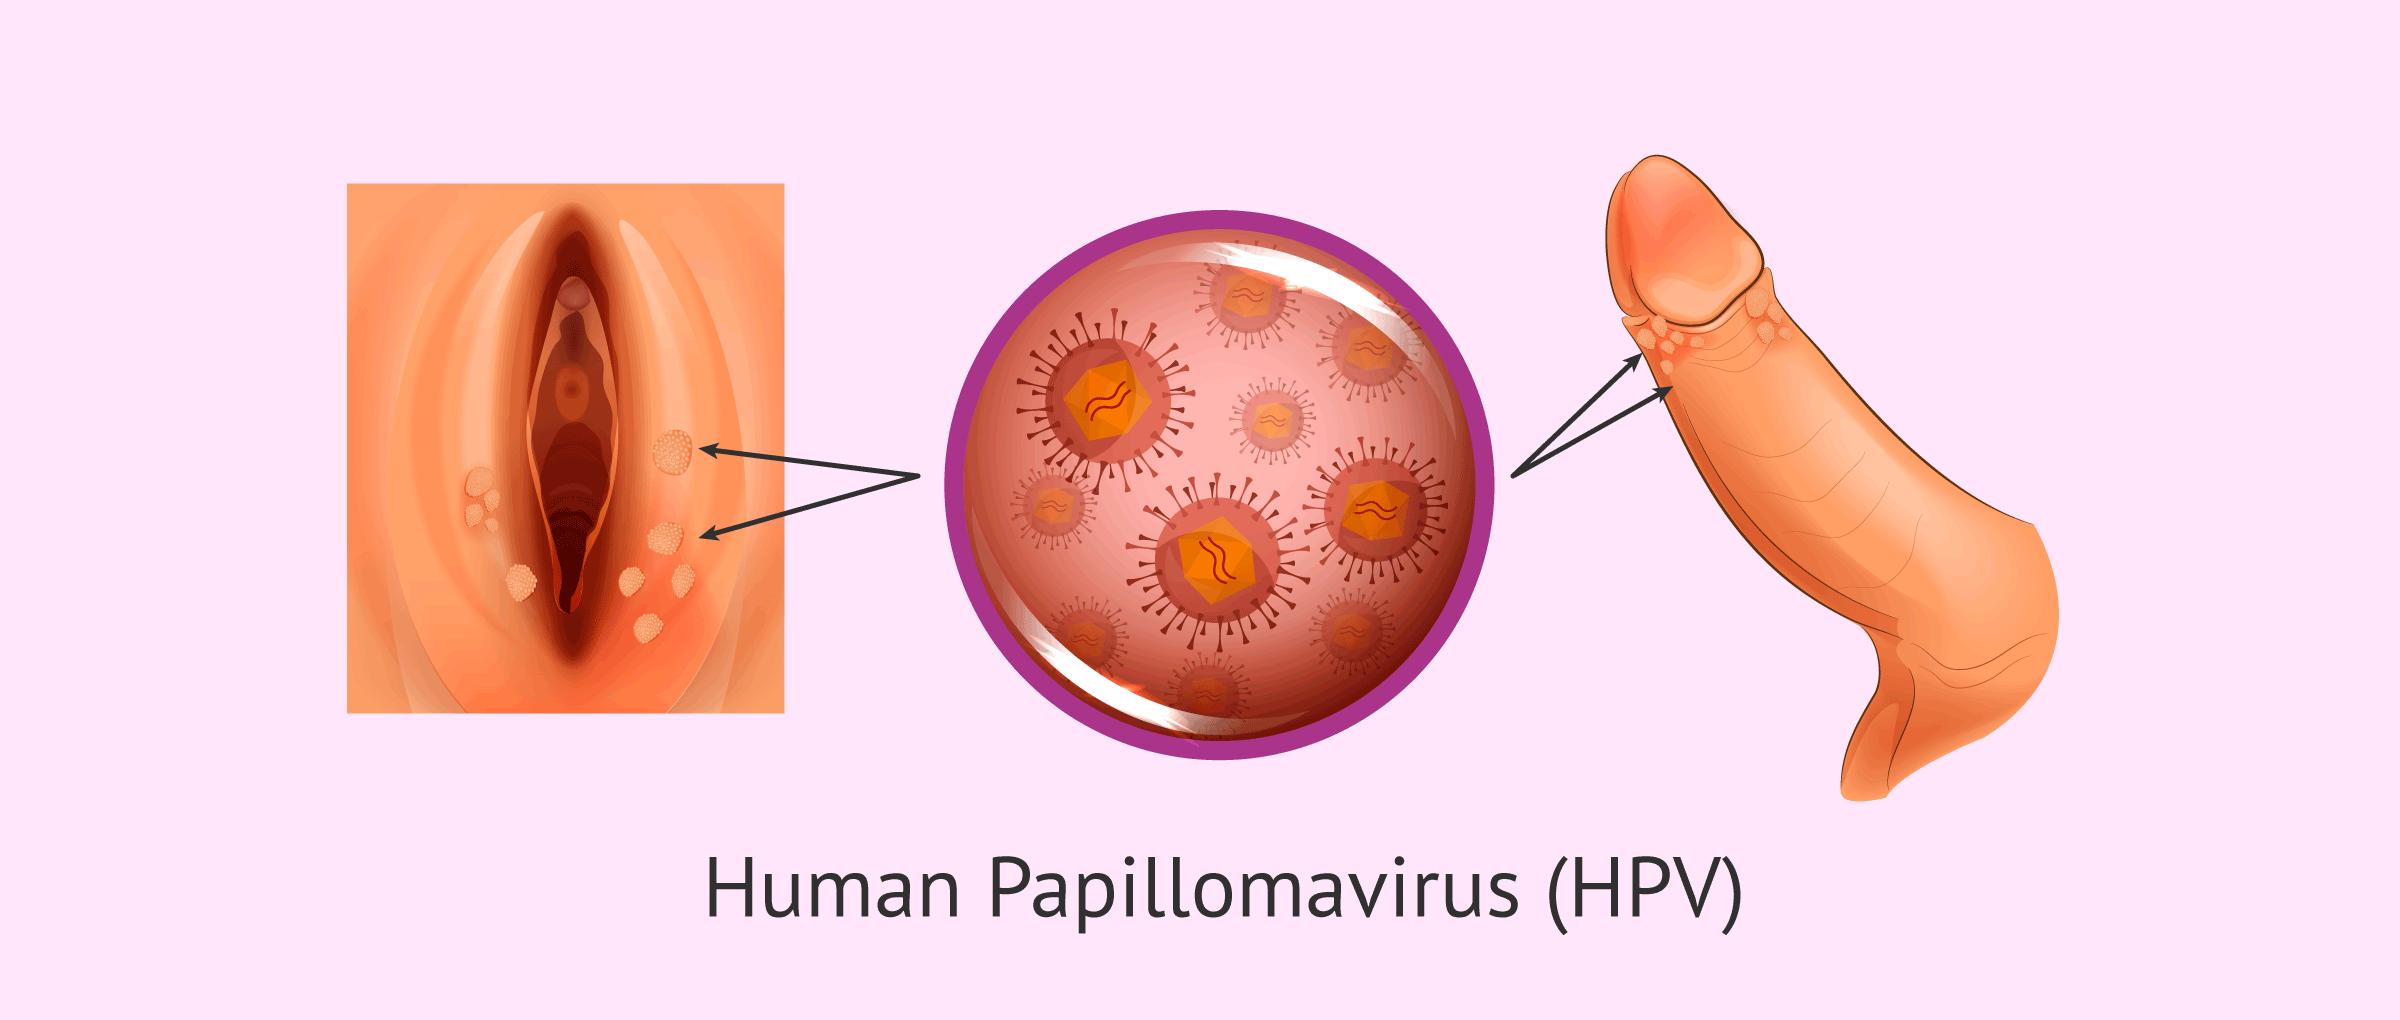 Hpv human papillomavirus symptoms. Mult mai mult decât documente.